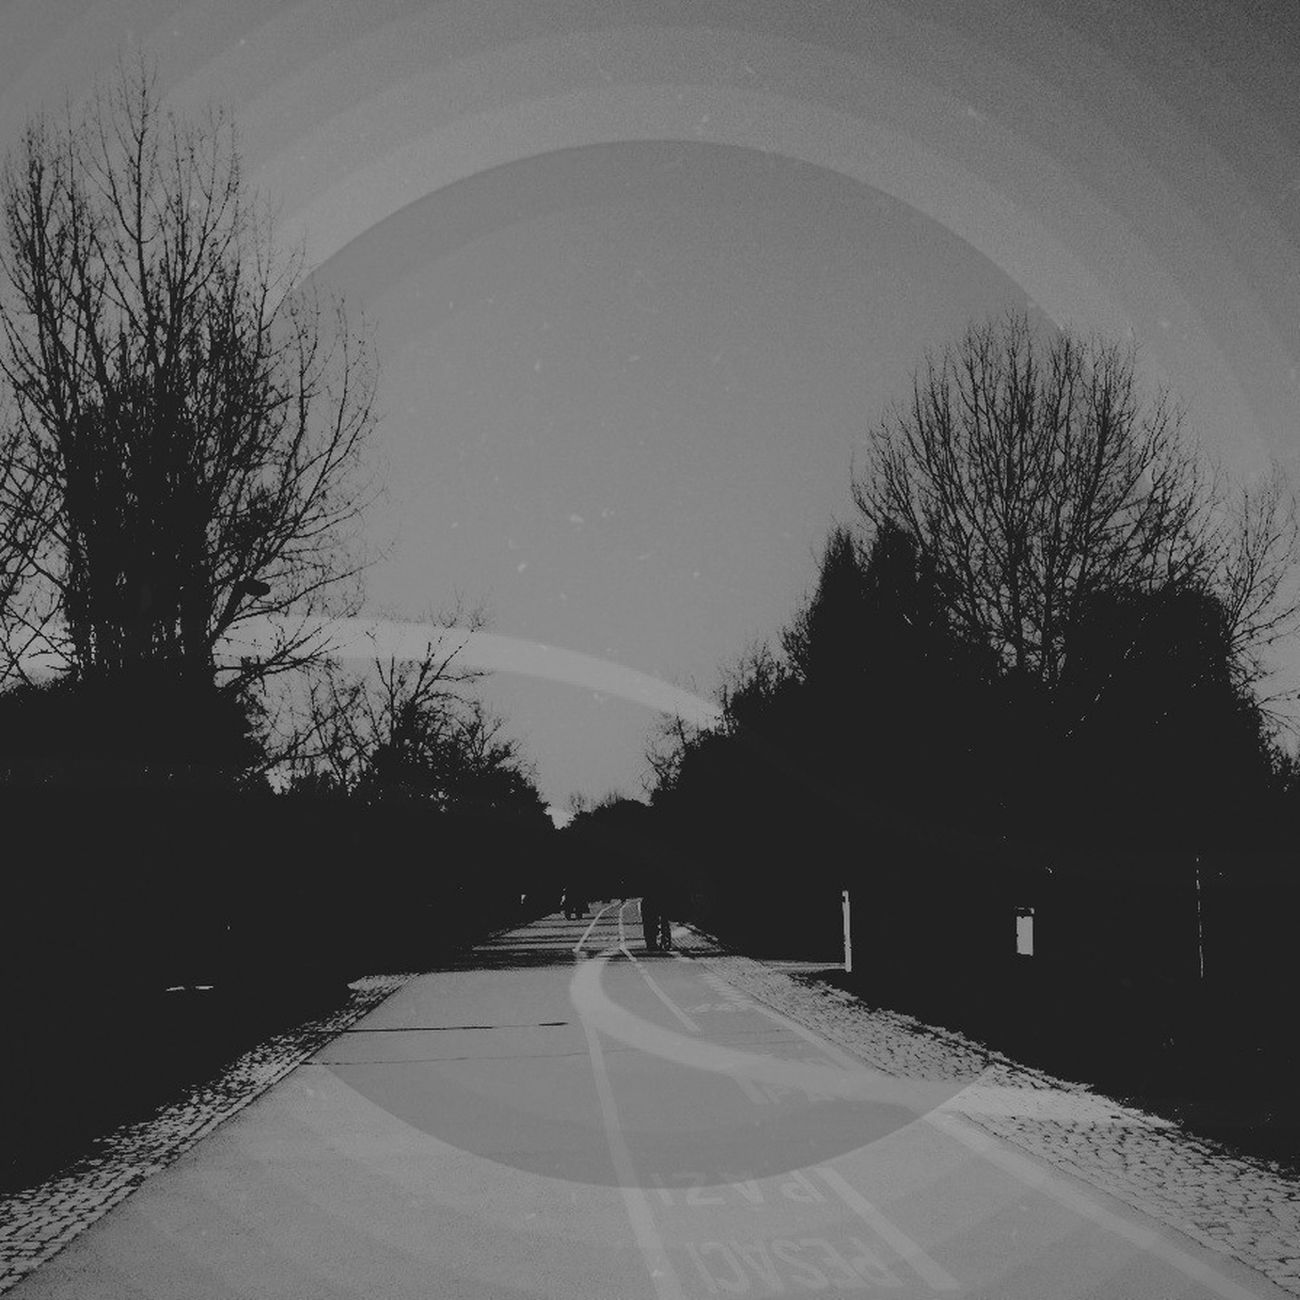 Blackandwhite Streetphoto_bw AMPt_community AMPt - Shoot Or Die